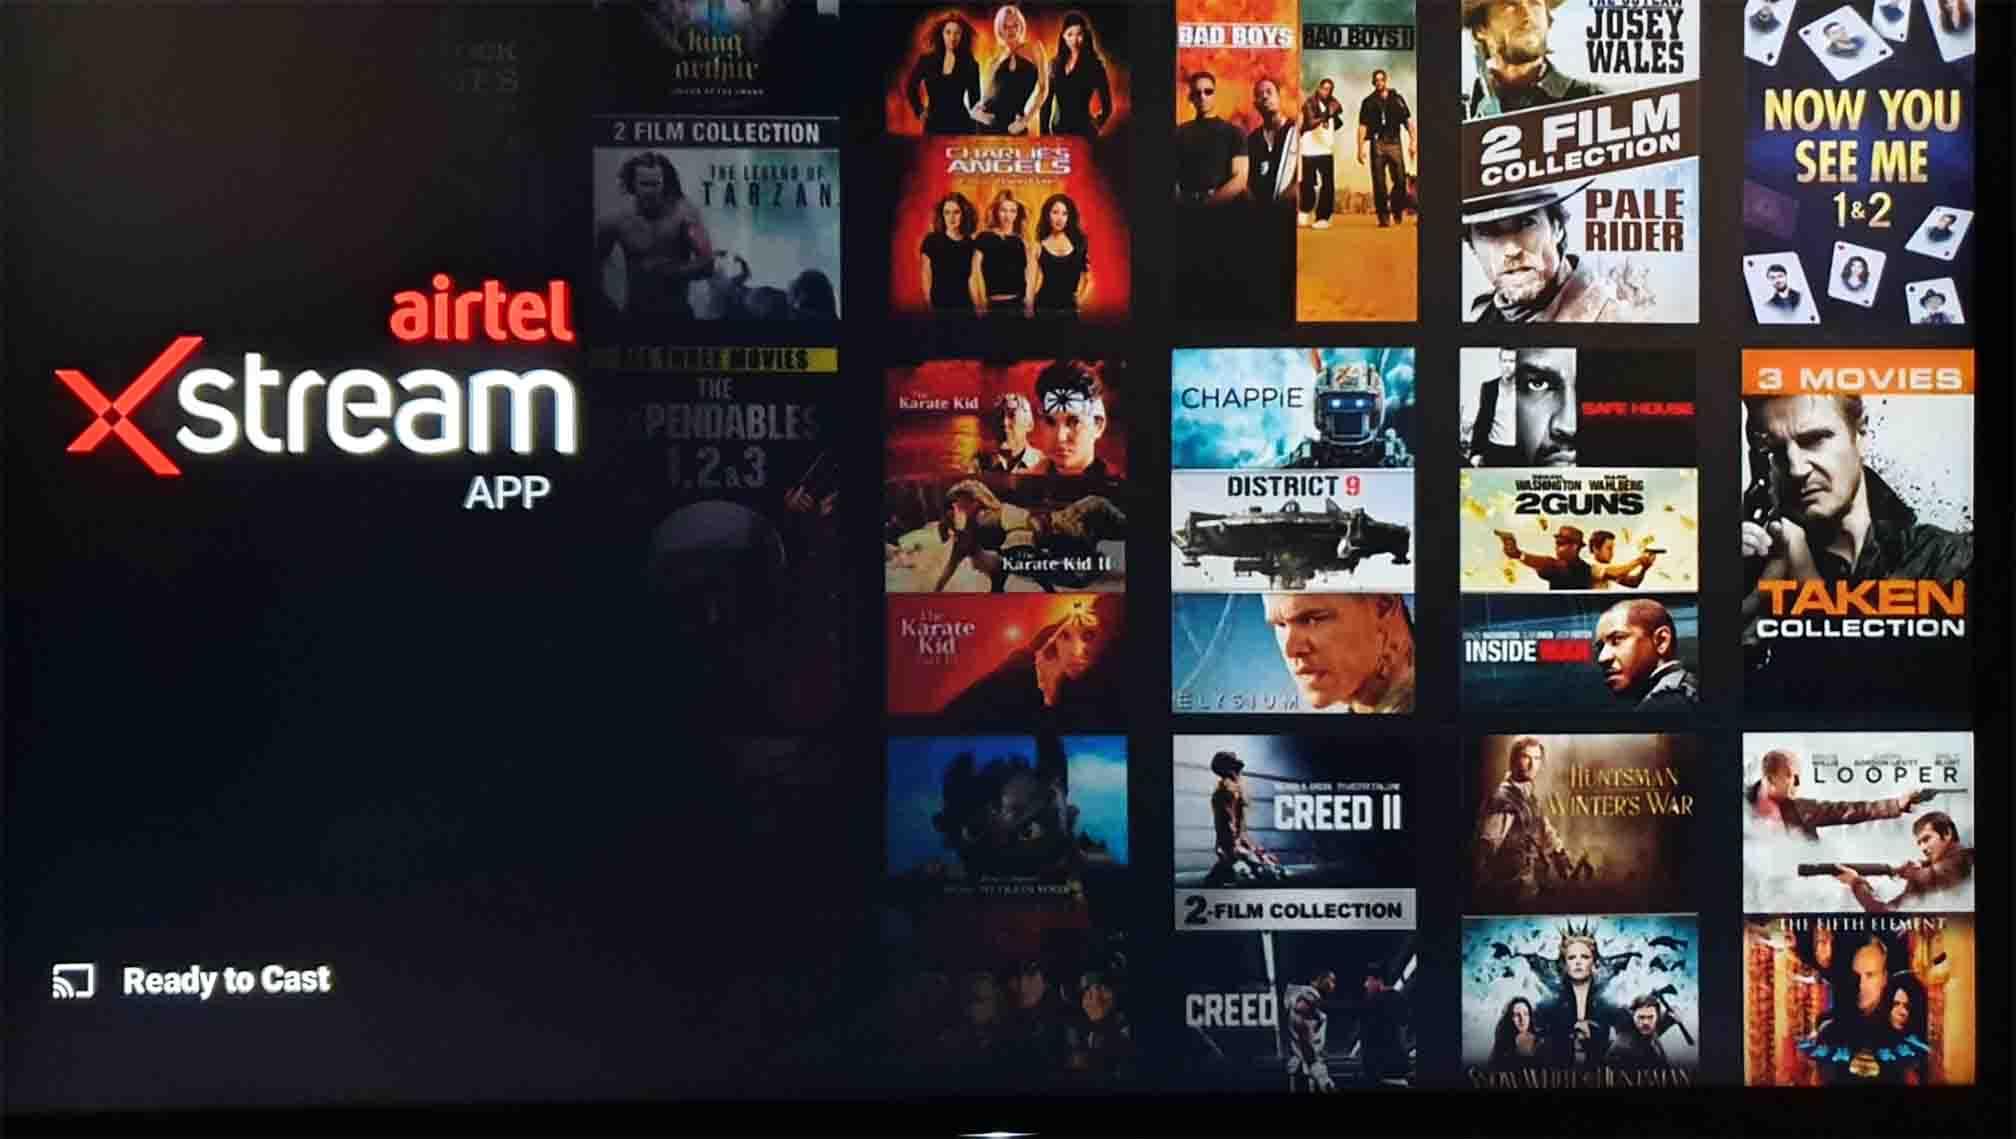 Airtel Xstream Chromecast